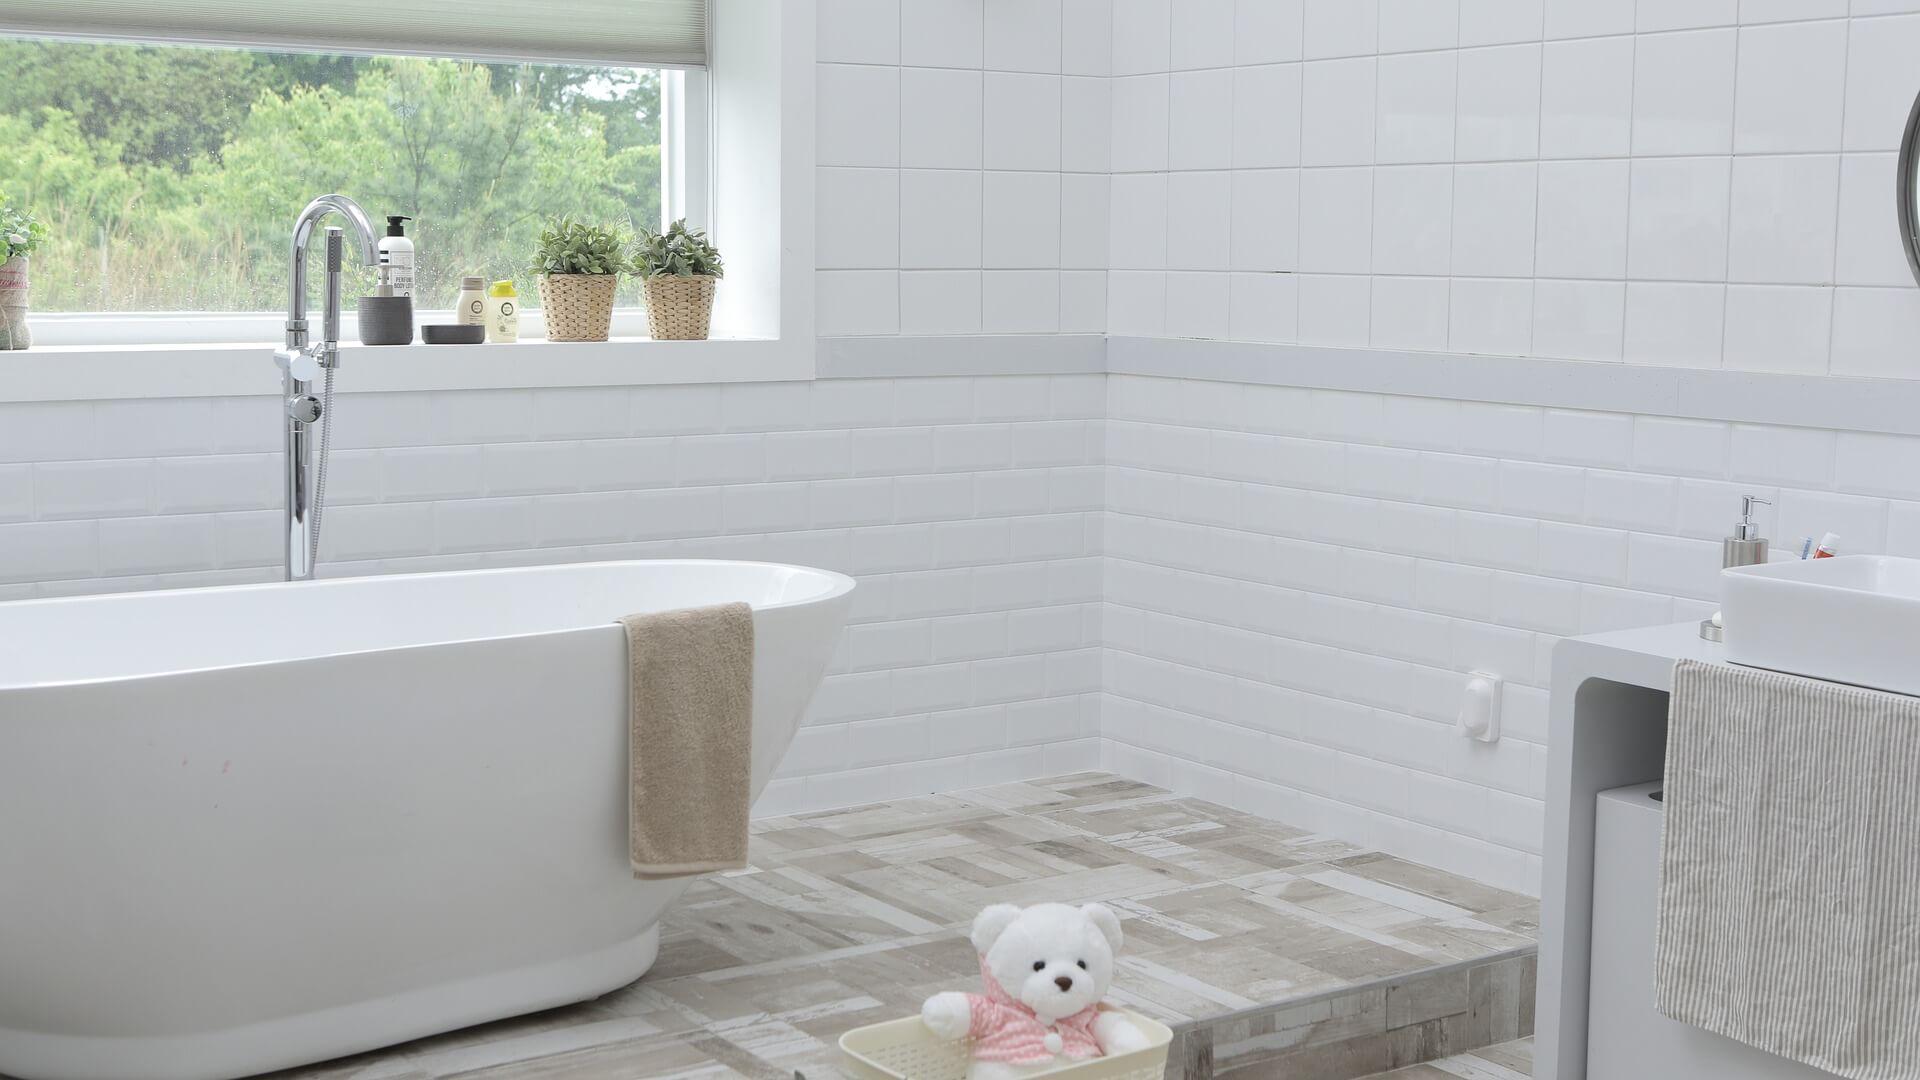 10 Small But Funky Bathroom Designs – Interior Design, Design News ...